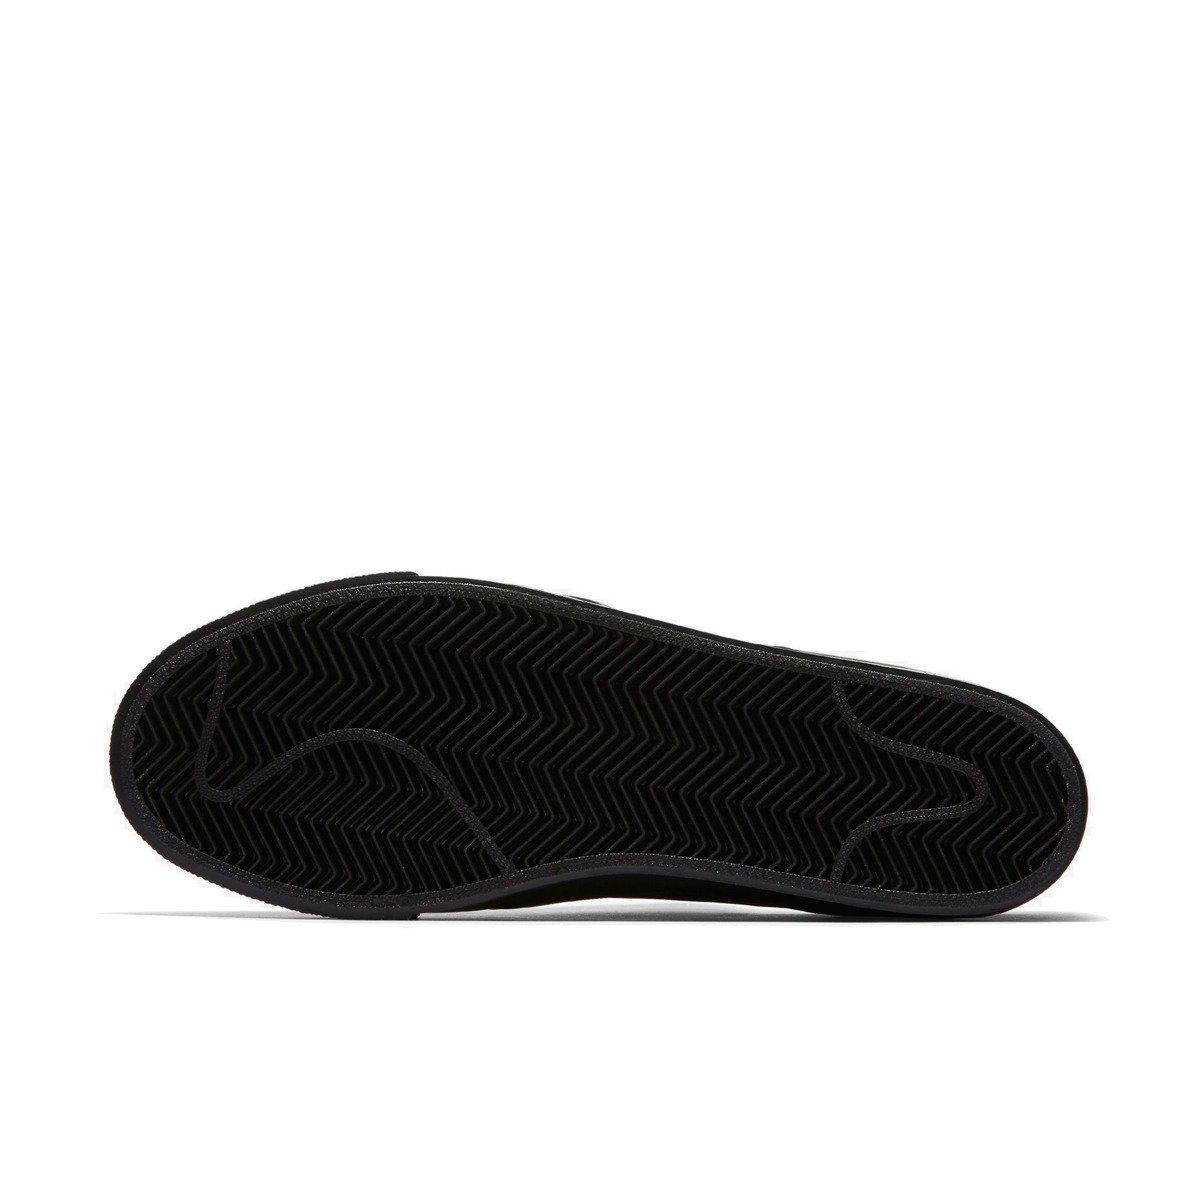 half off b83af f2675 ... shoes nike sb air zoom stefan janoski elite ht black black-anthracite- sail Click to zoom ...